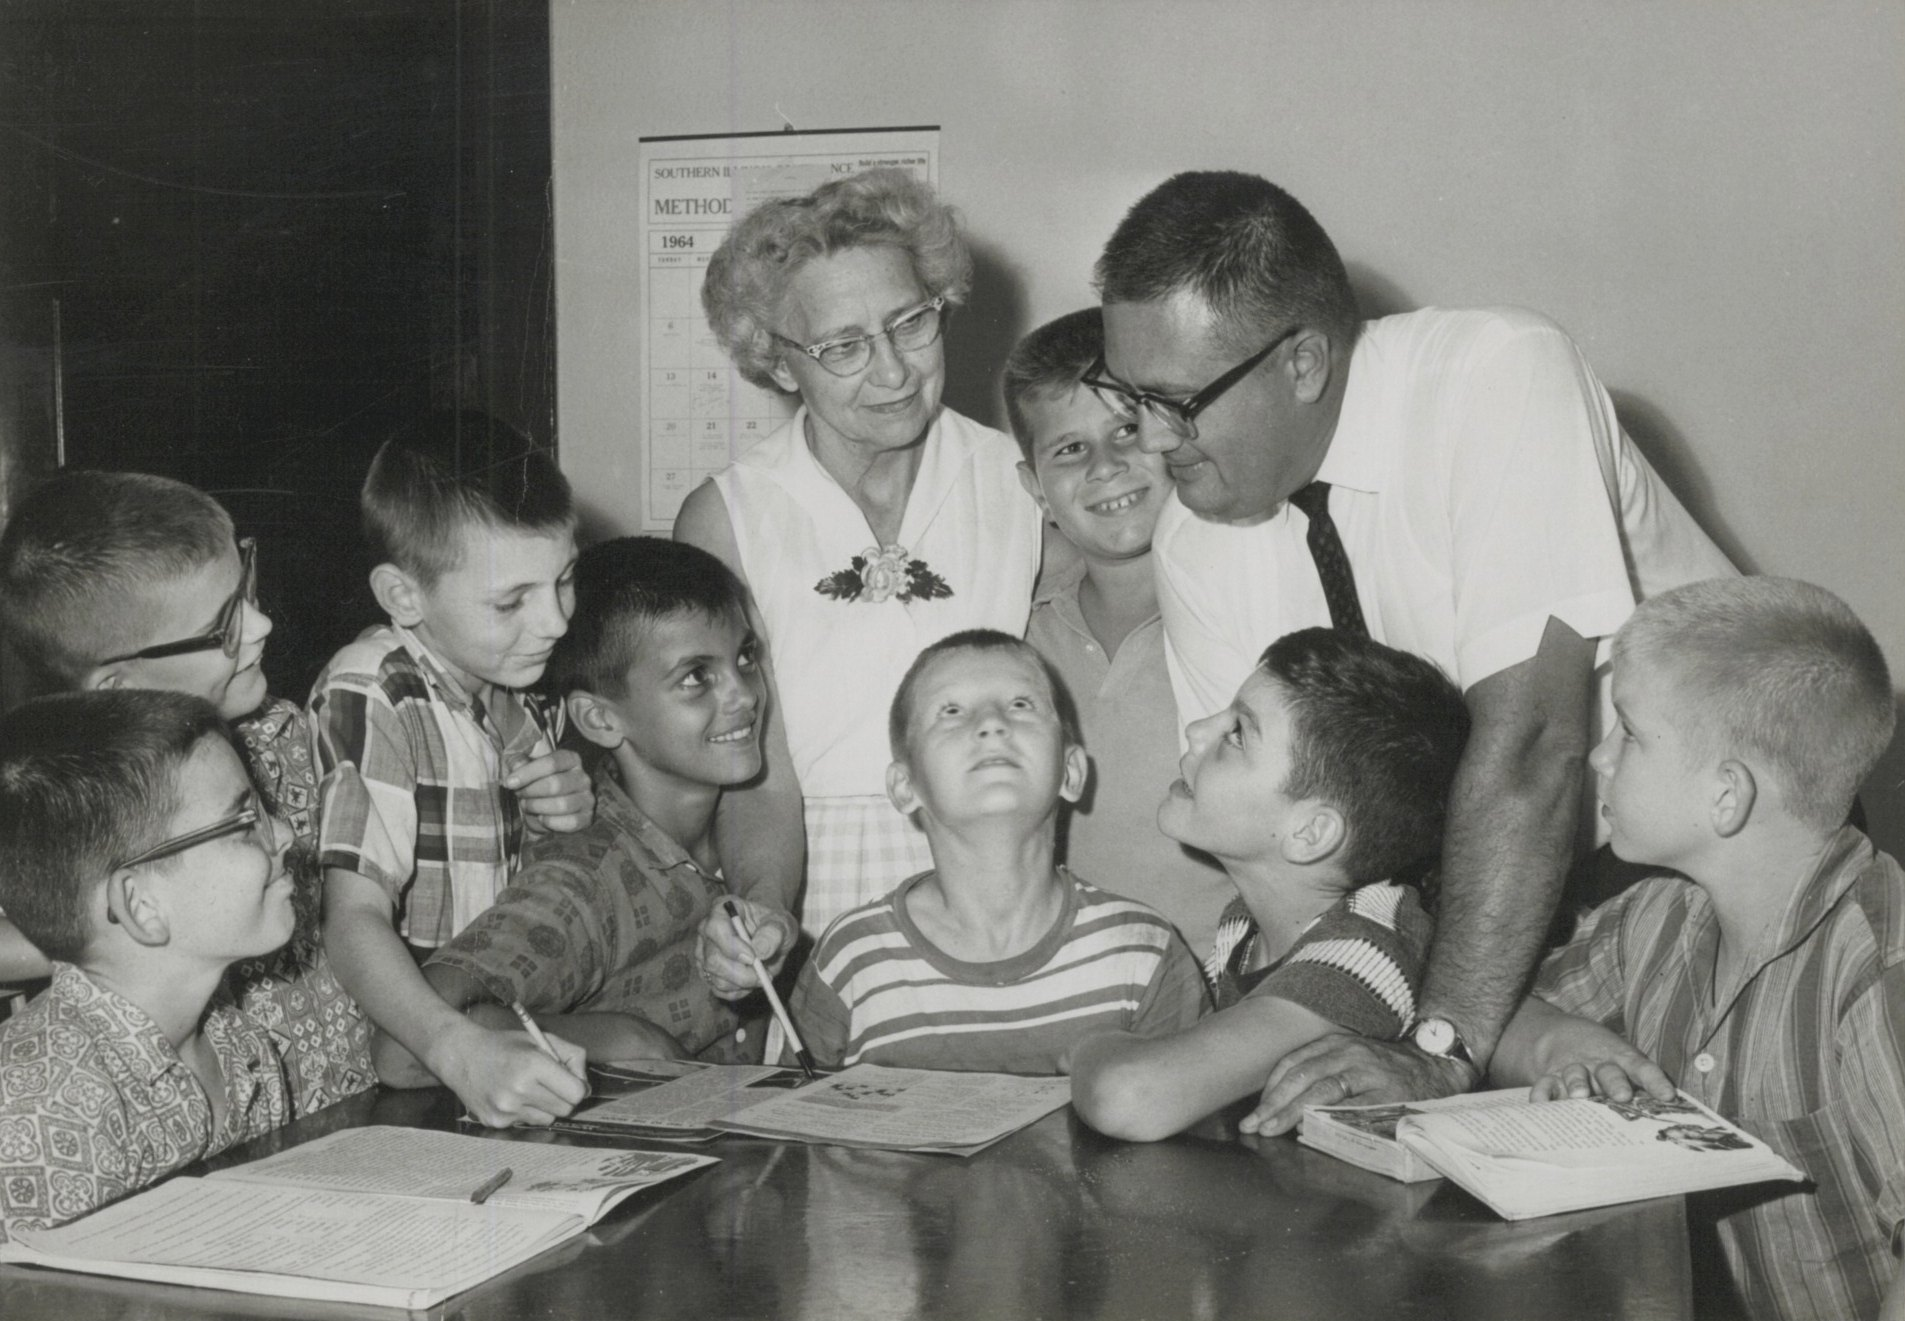 1960s Marion Farmer